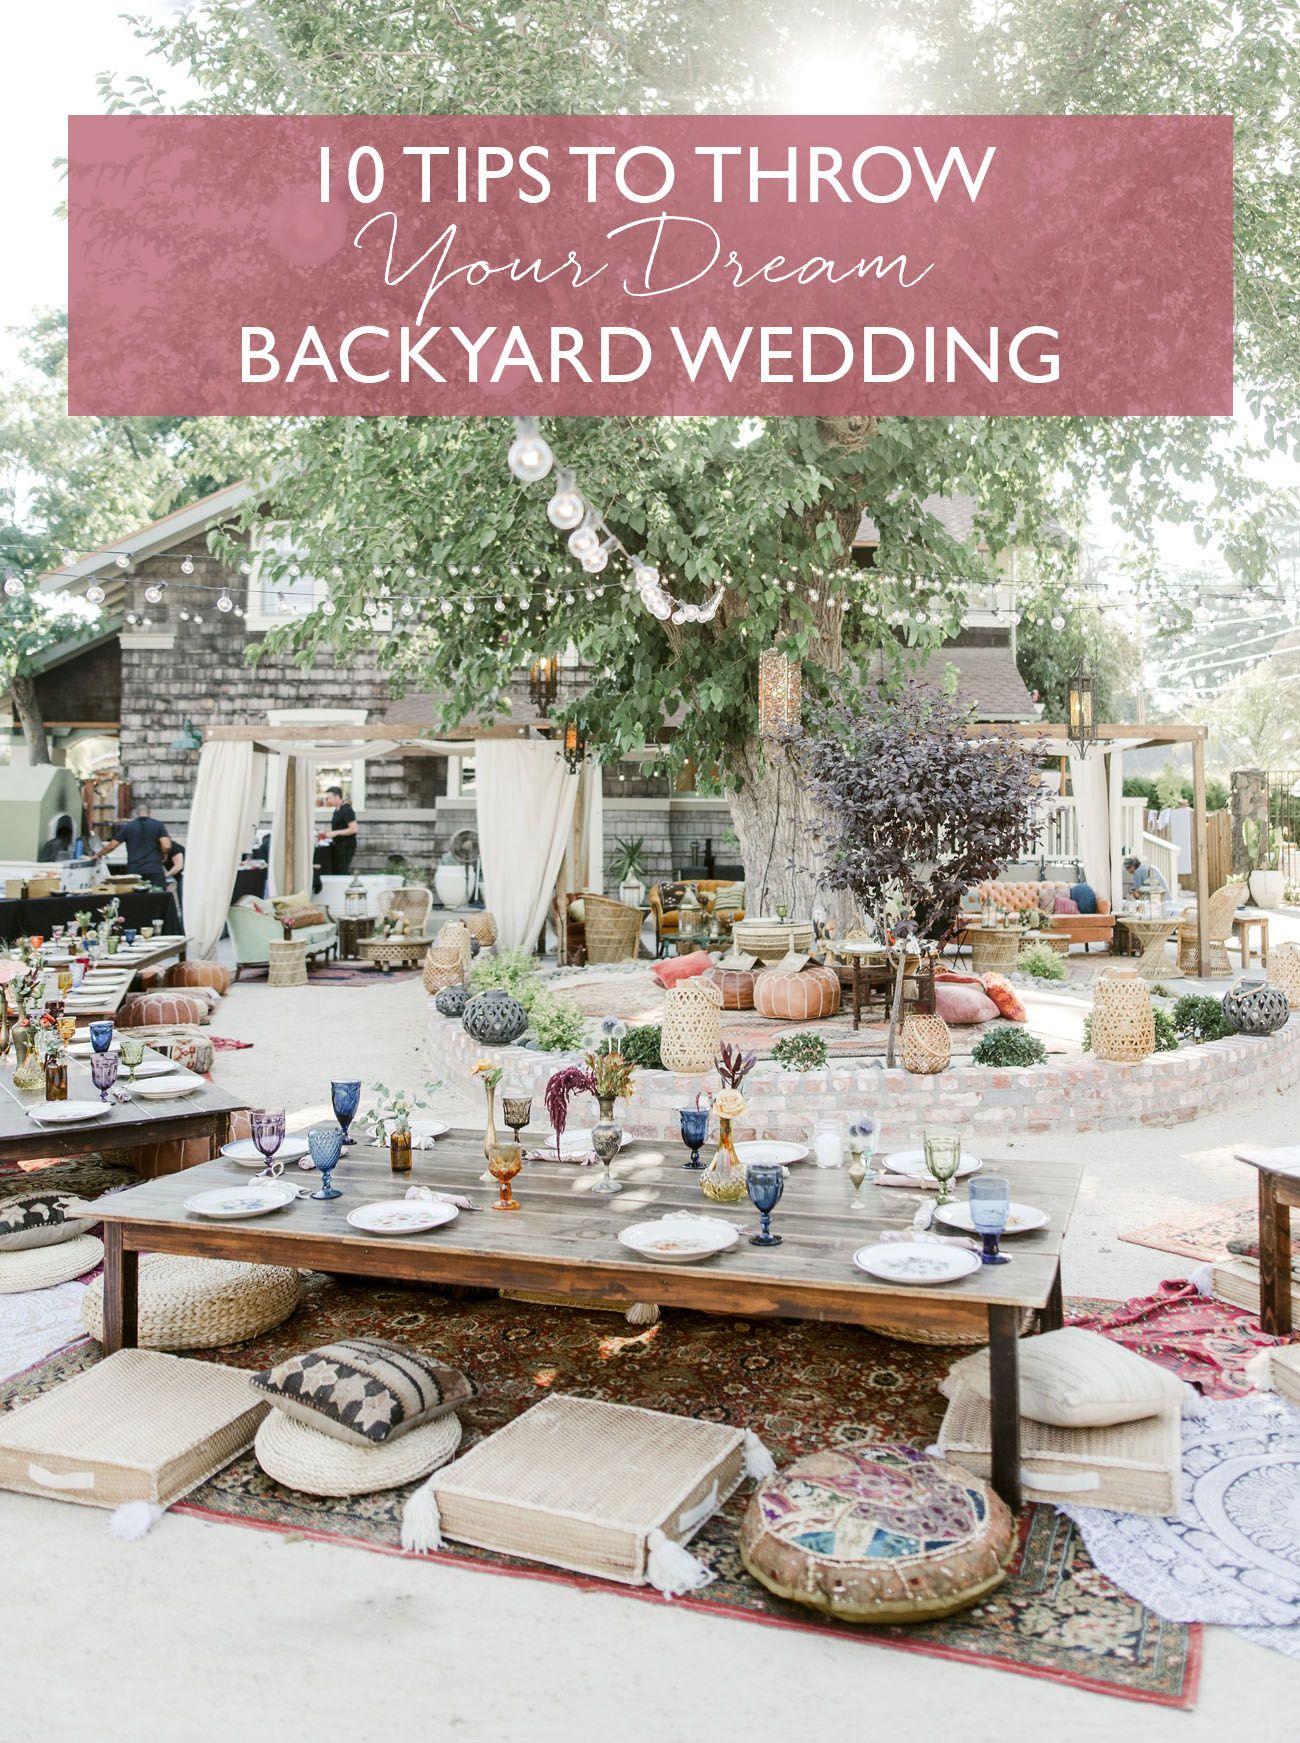 10 Tips to Throw Your Dream Backyard Wedding | Wedding ...